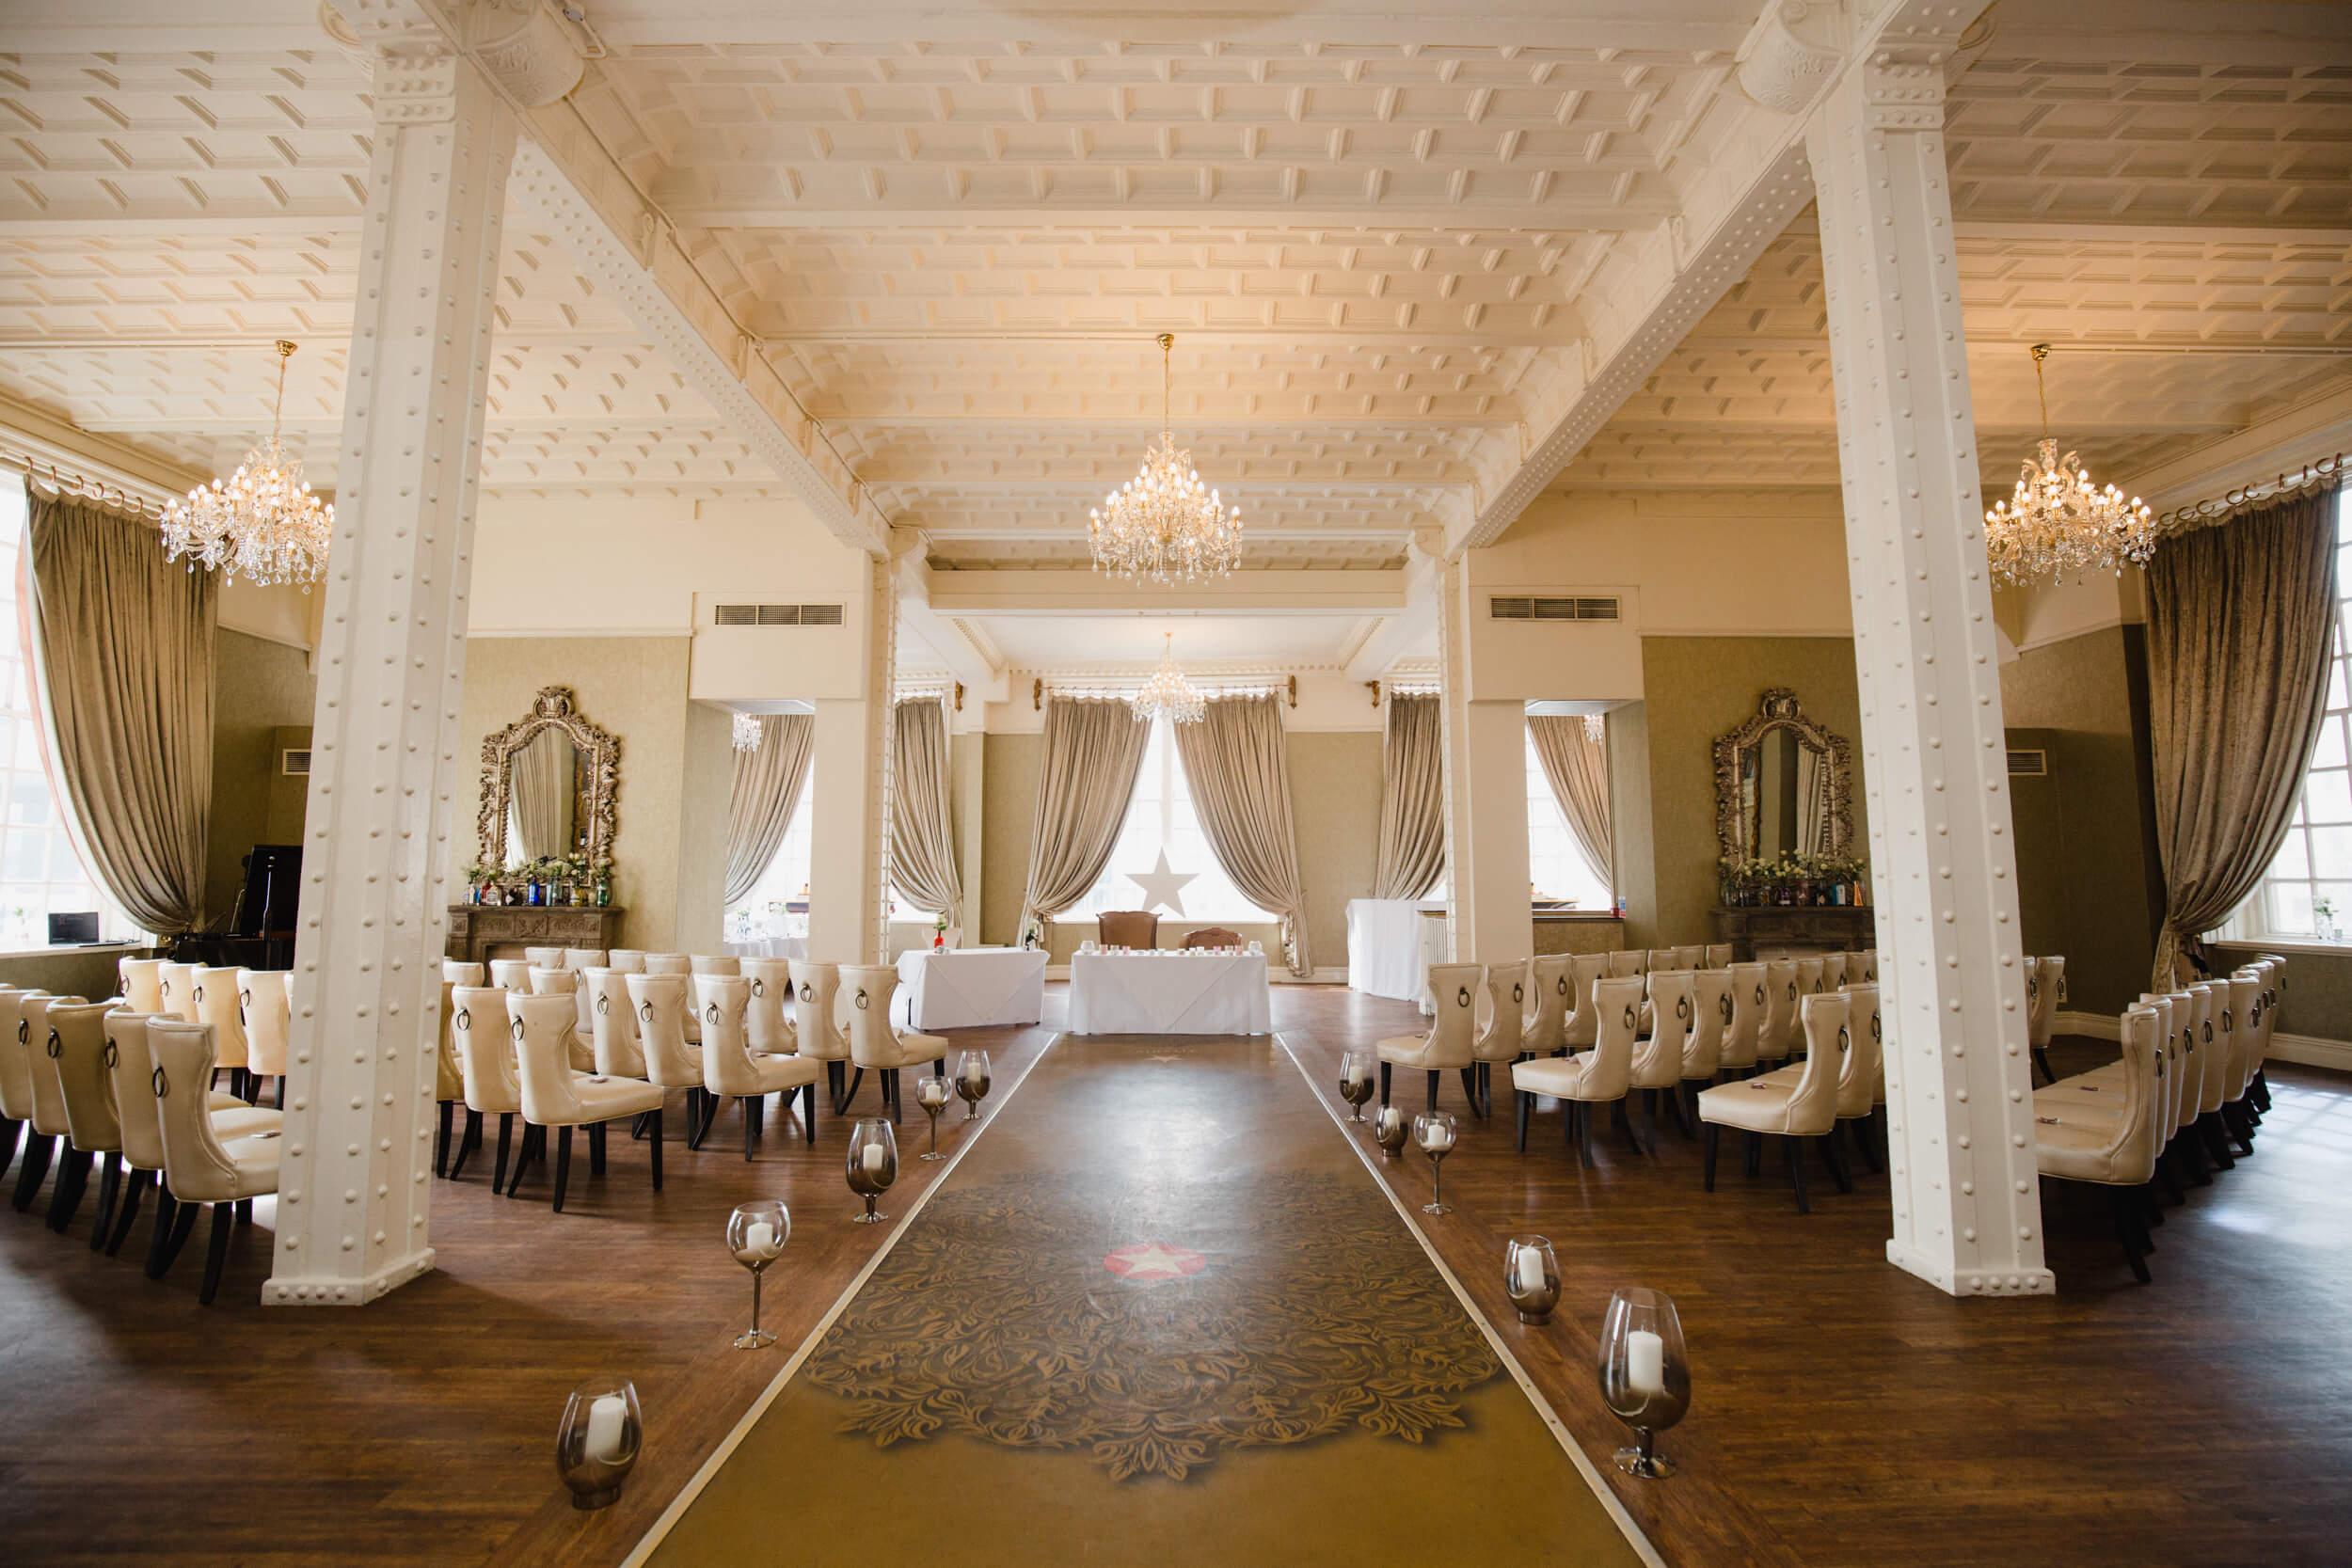 30_James_Street_Hotel_Wedding_Venue_016.jpg